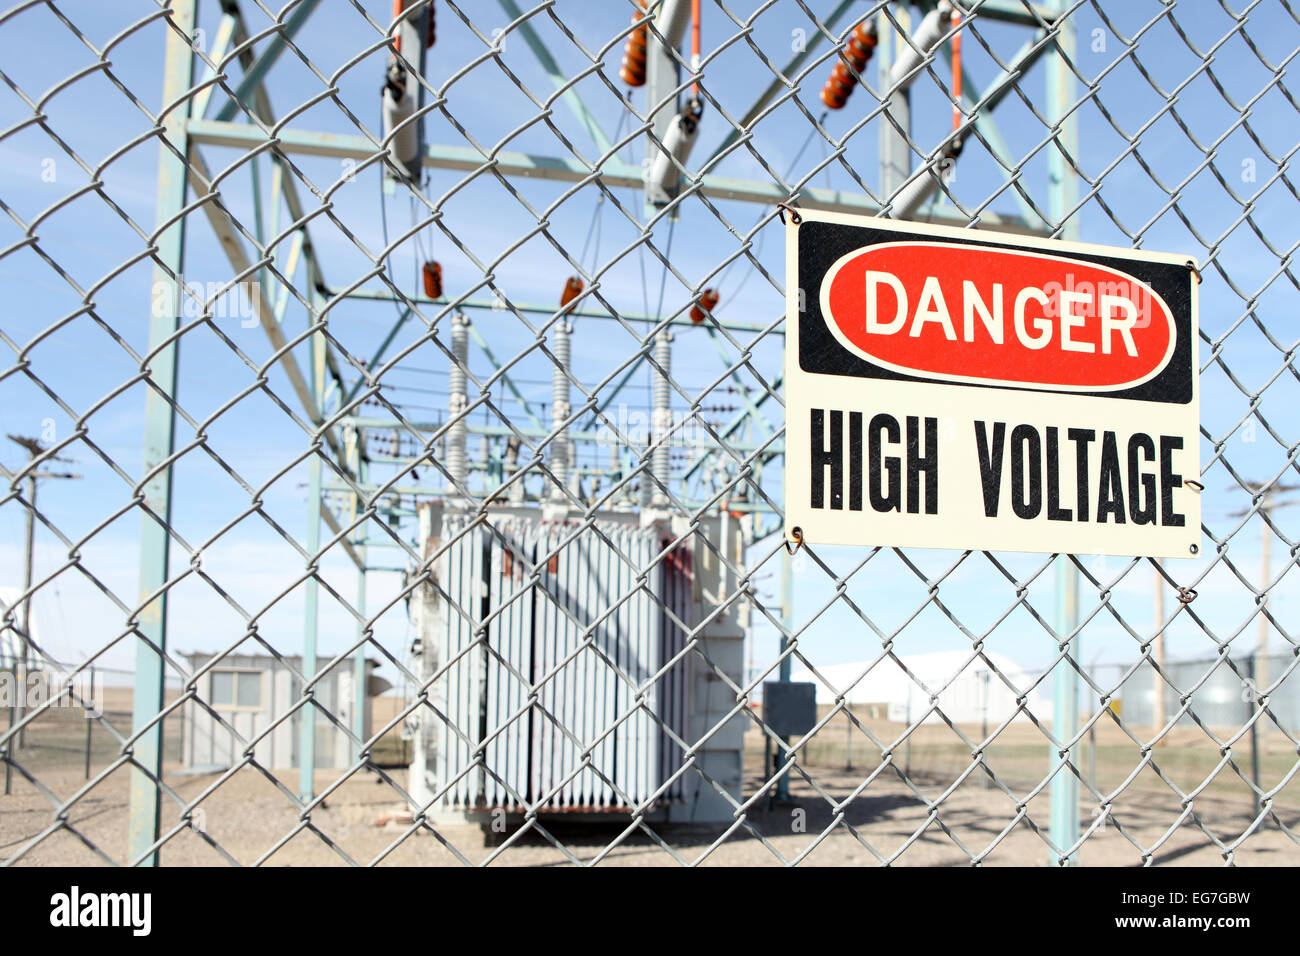 Danger High Voltage Stock Photos & Danger High Voltage Stock Images ...